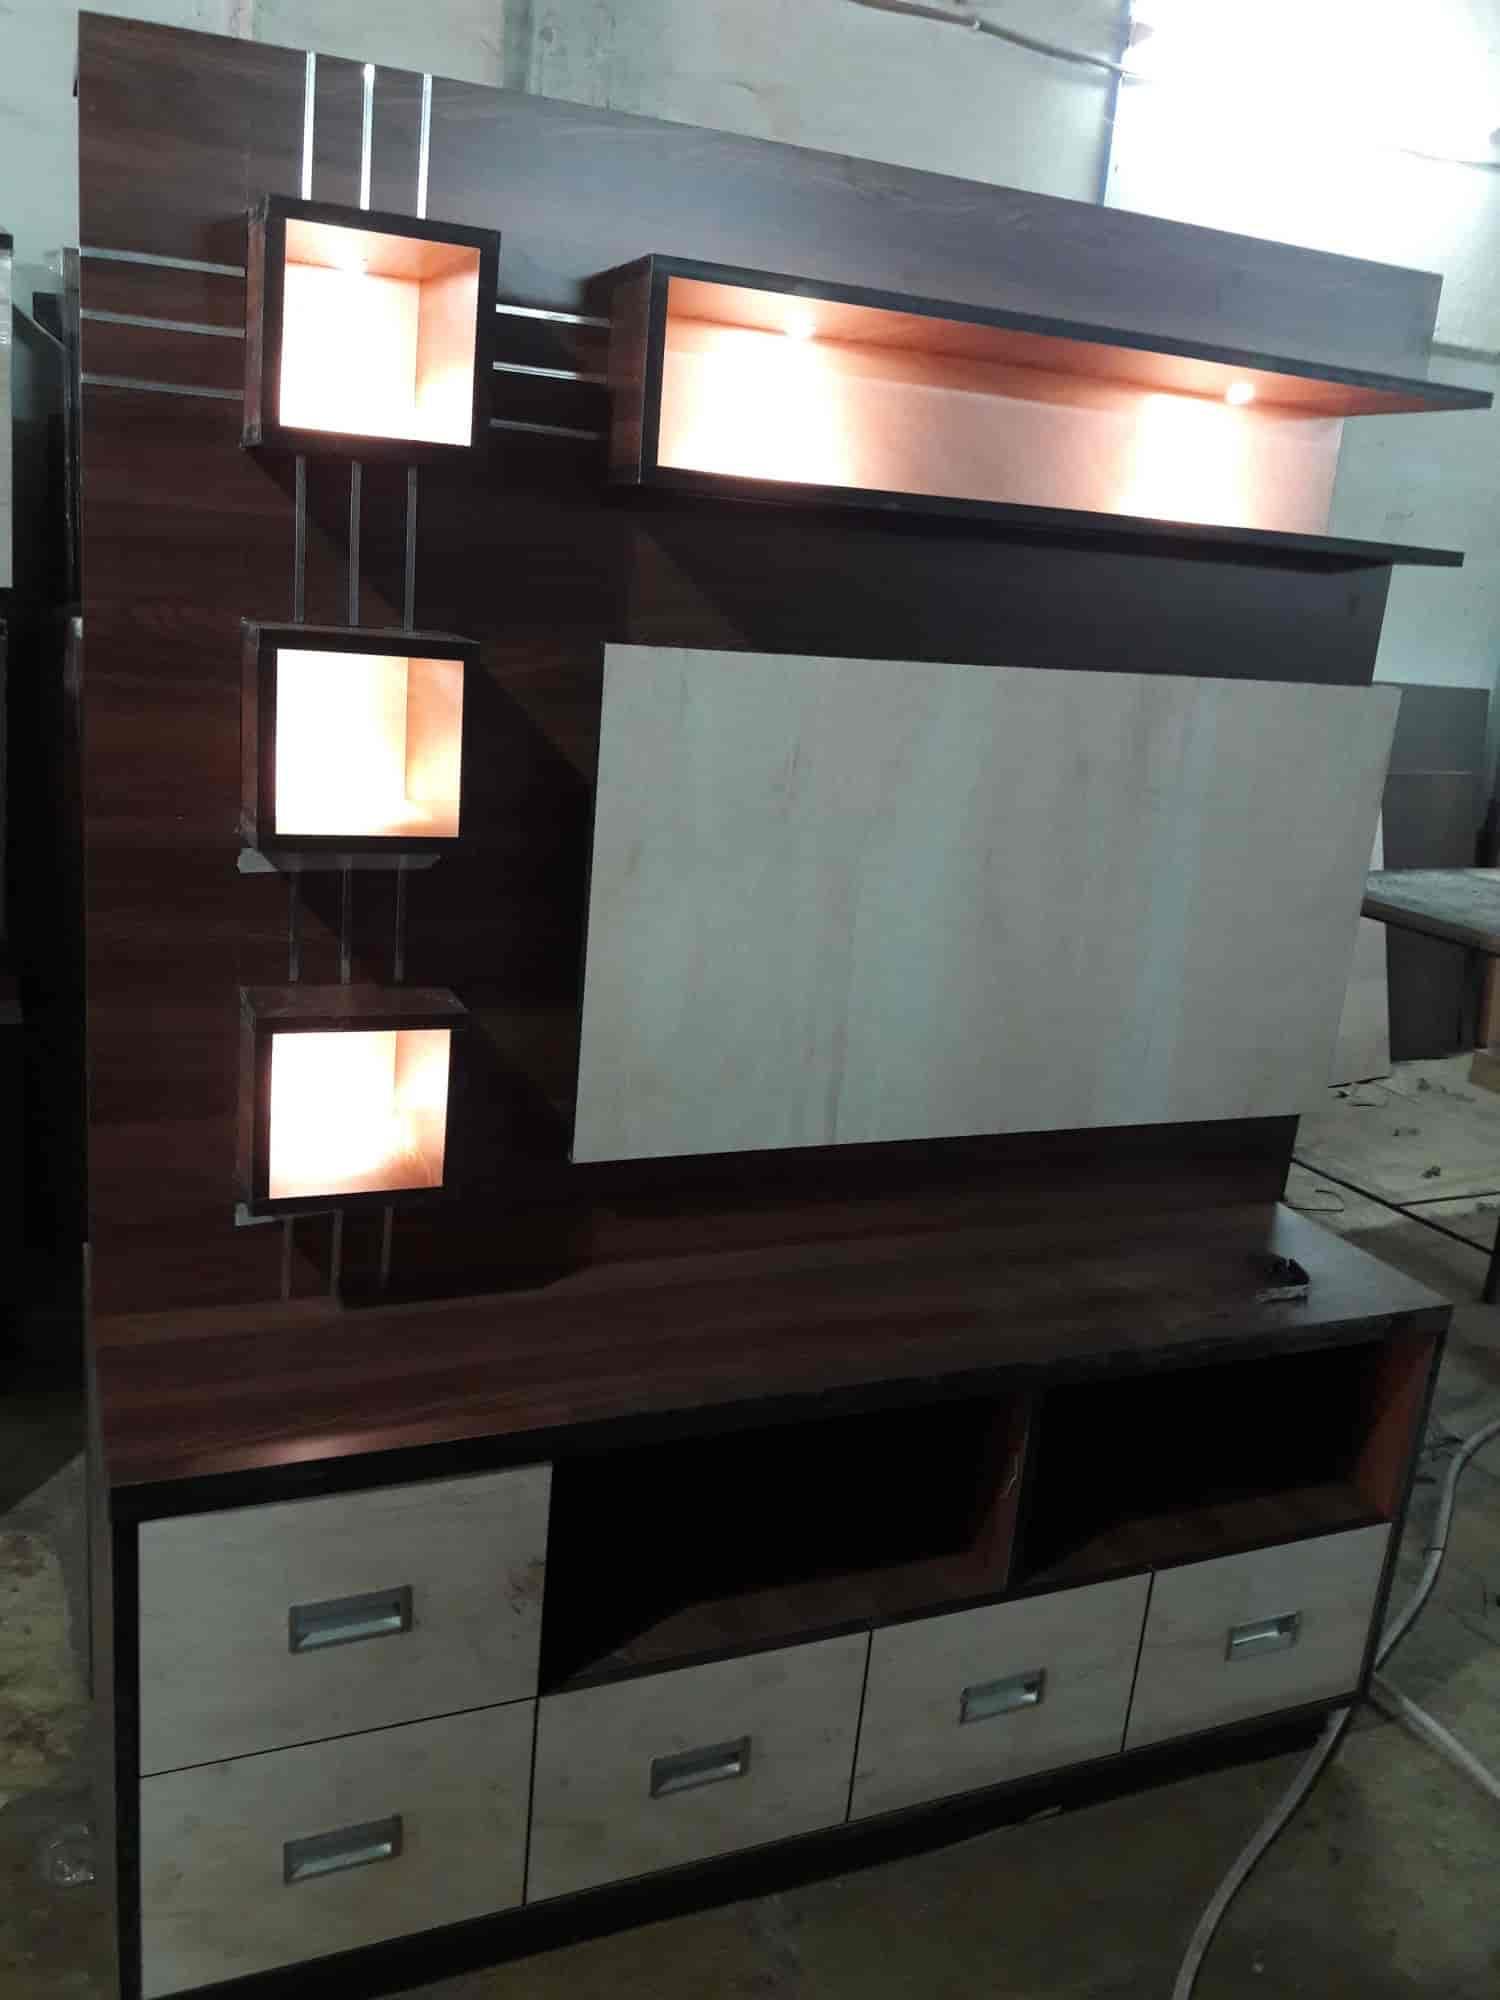 neelkamal wholesale furniture photos narol ahmedabad pictures